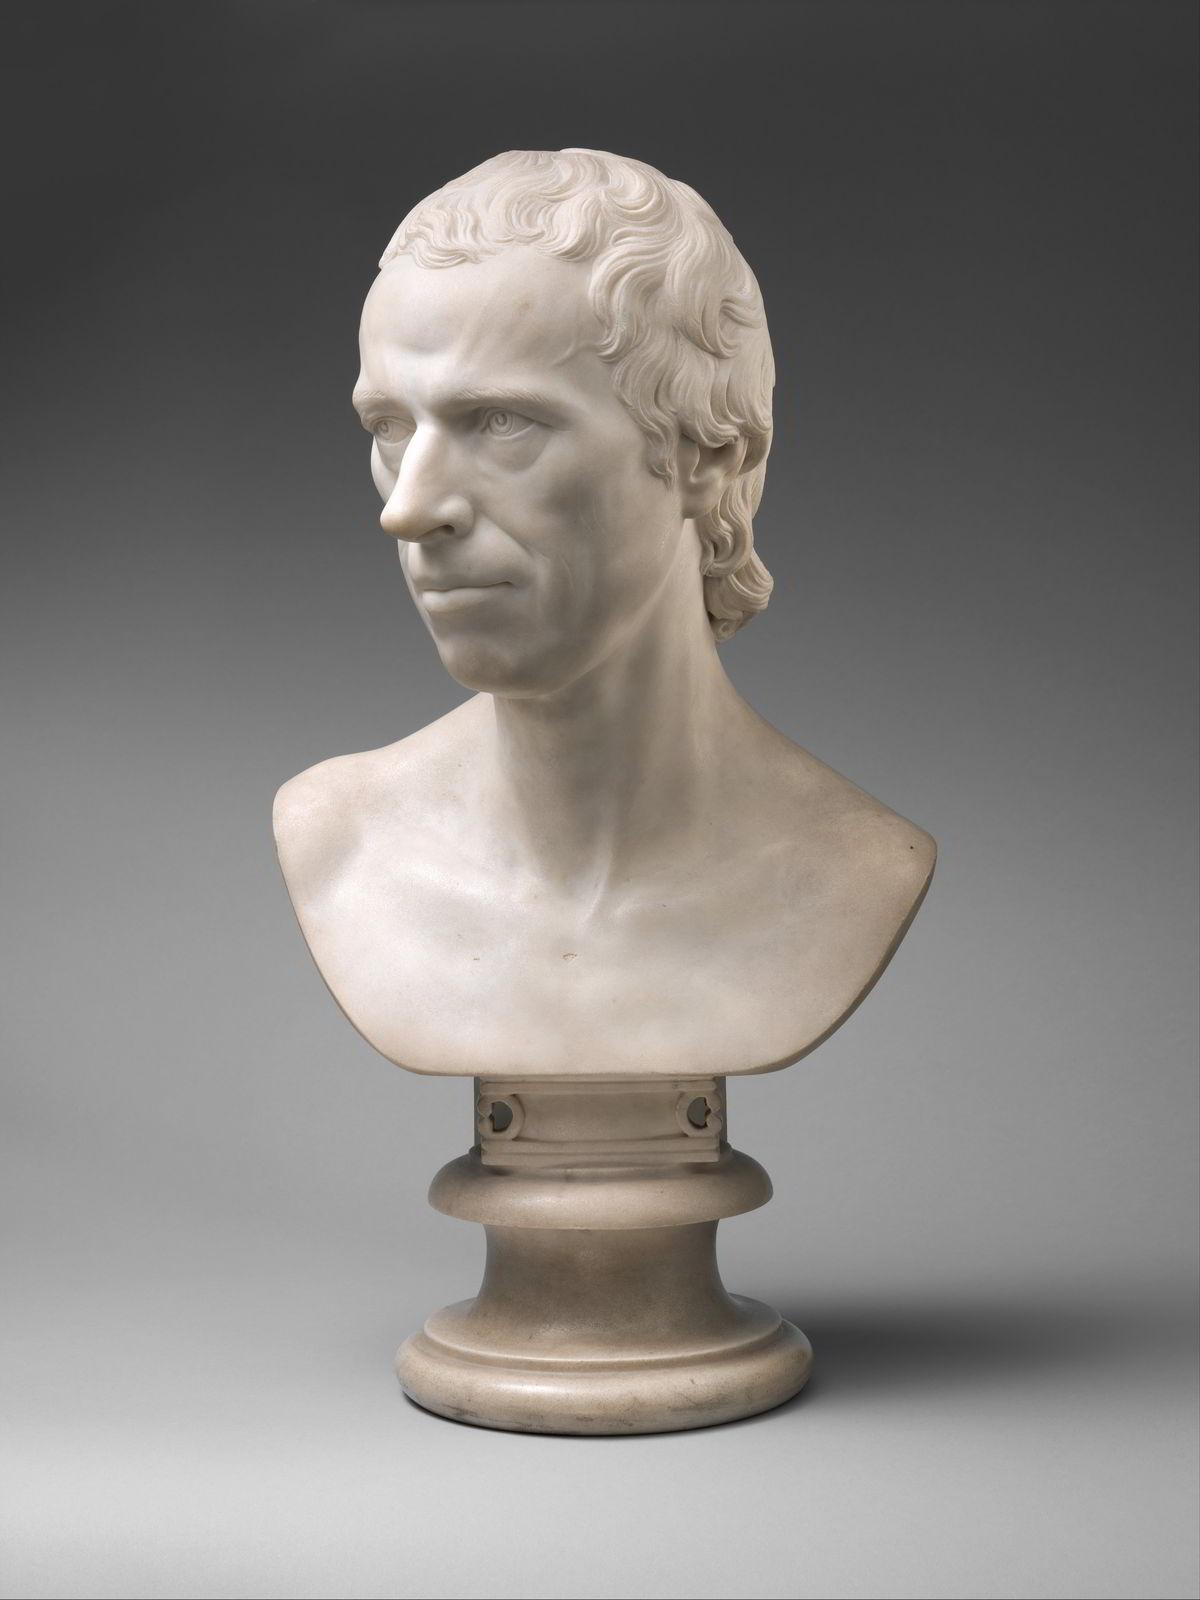 Laurence Sterne by Joseph Nollekens